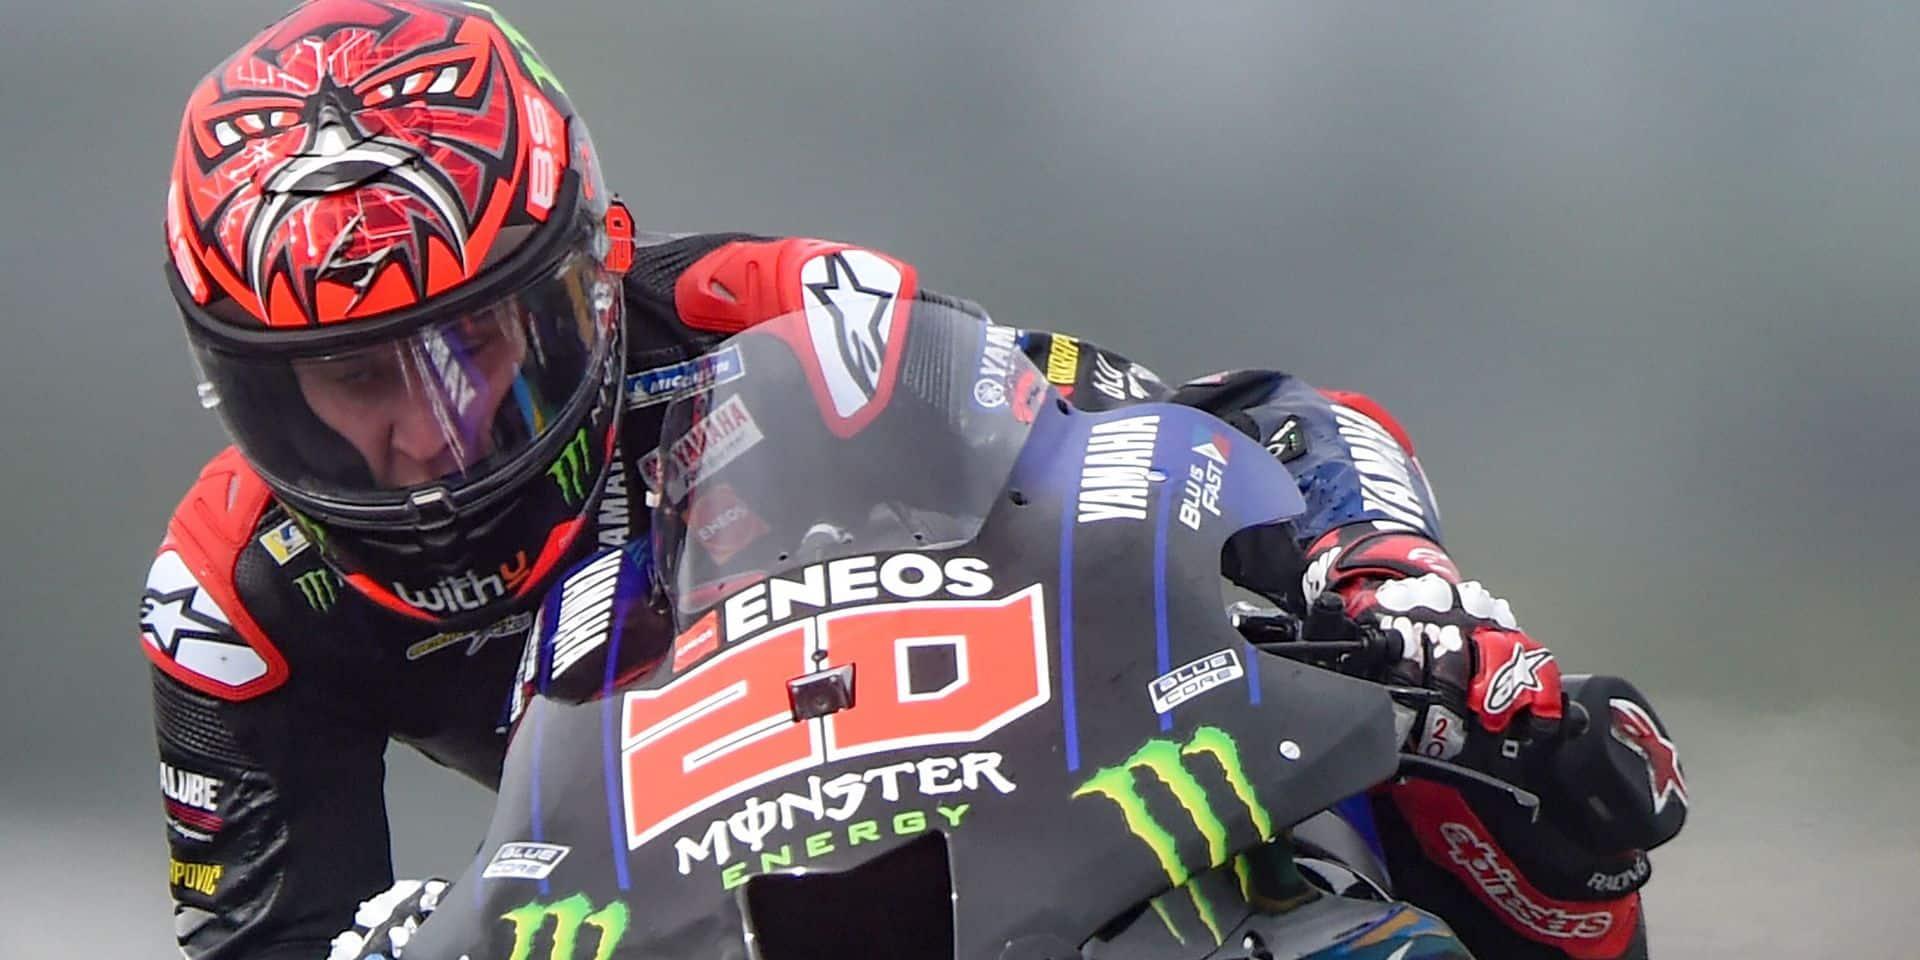 Moto GP: Quartararo en pole à domicile